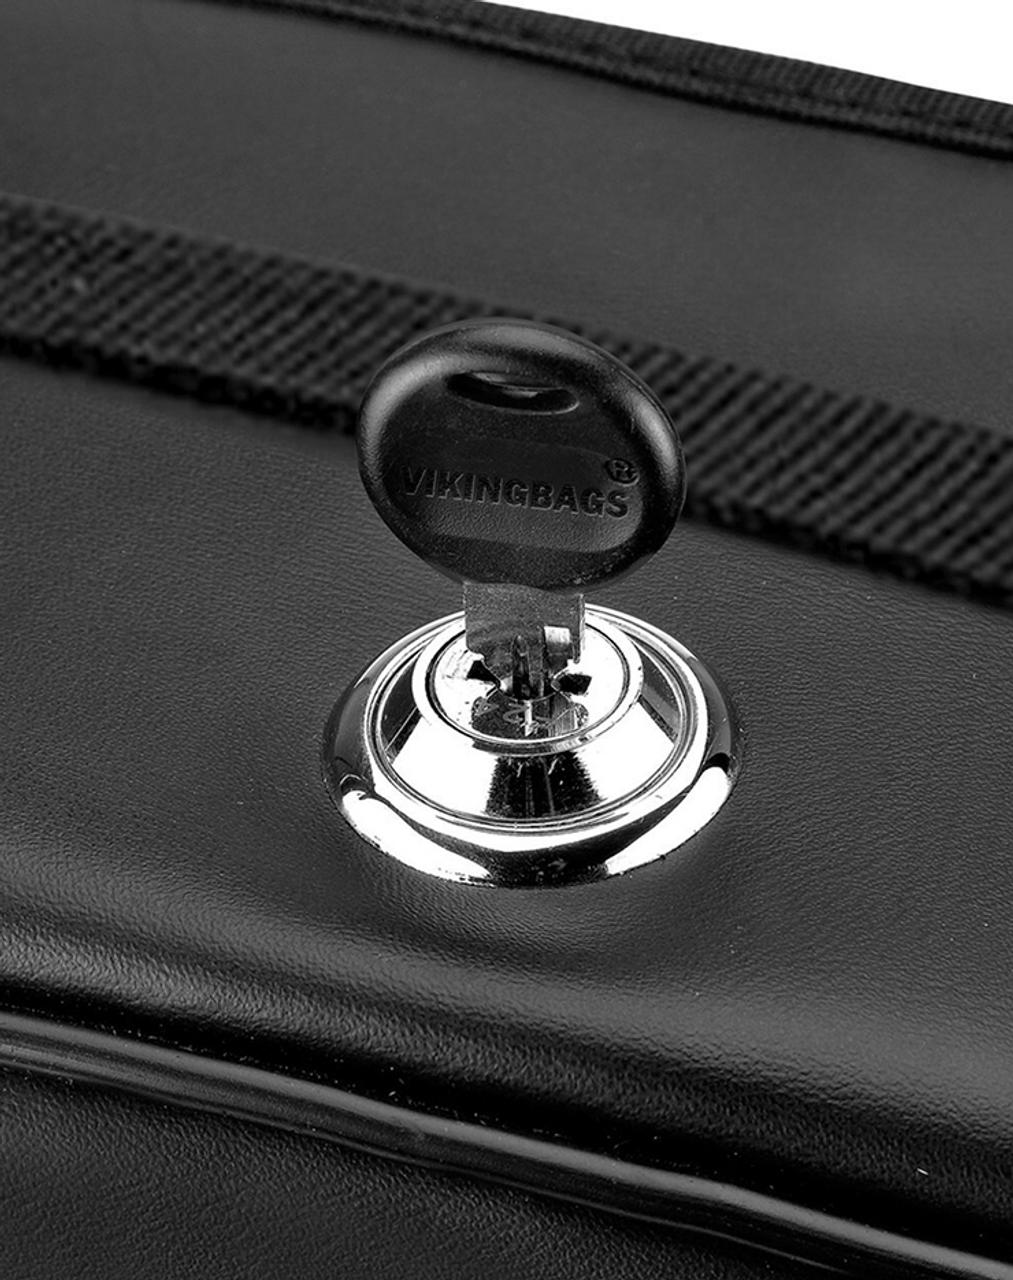 Triumph Rocket III Roadster Viking Armor Shock Cutout Studded Motorcycle Saddlebags Key Lock View